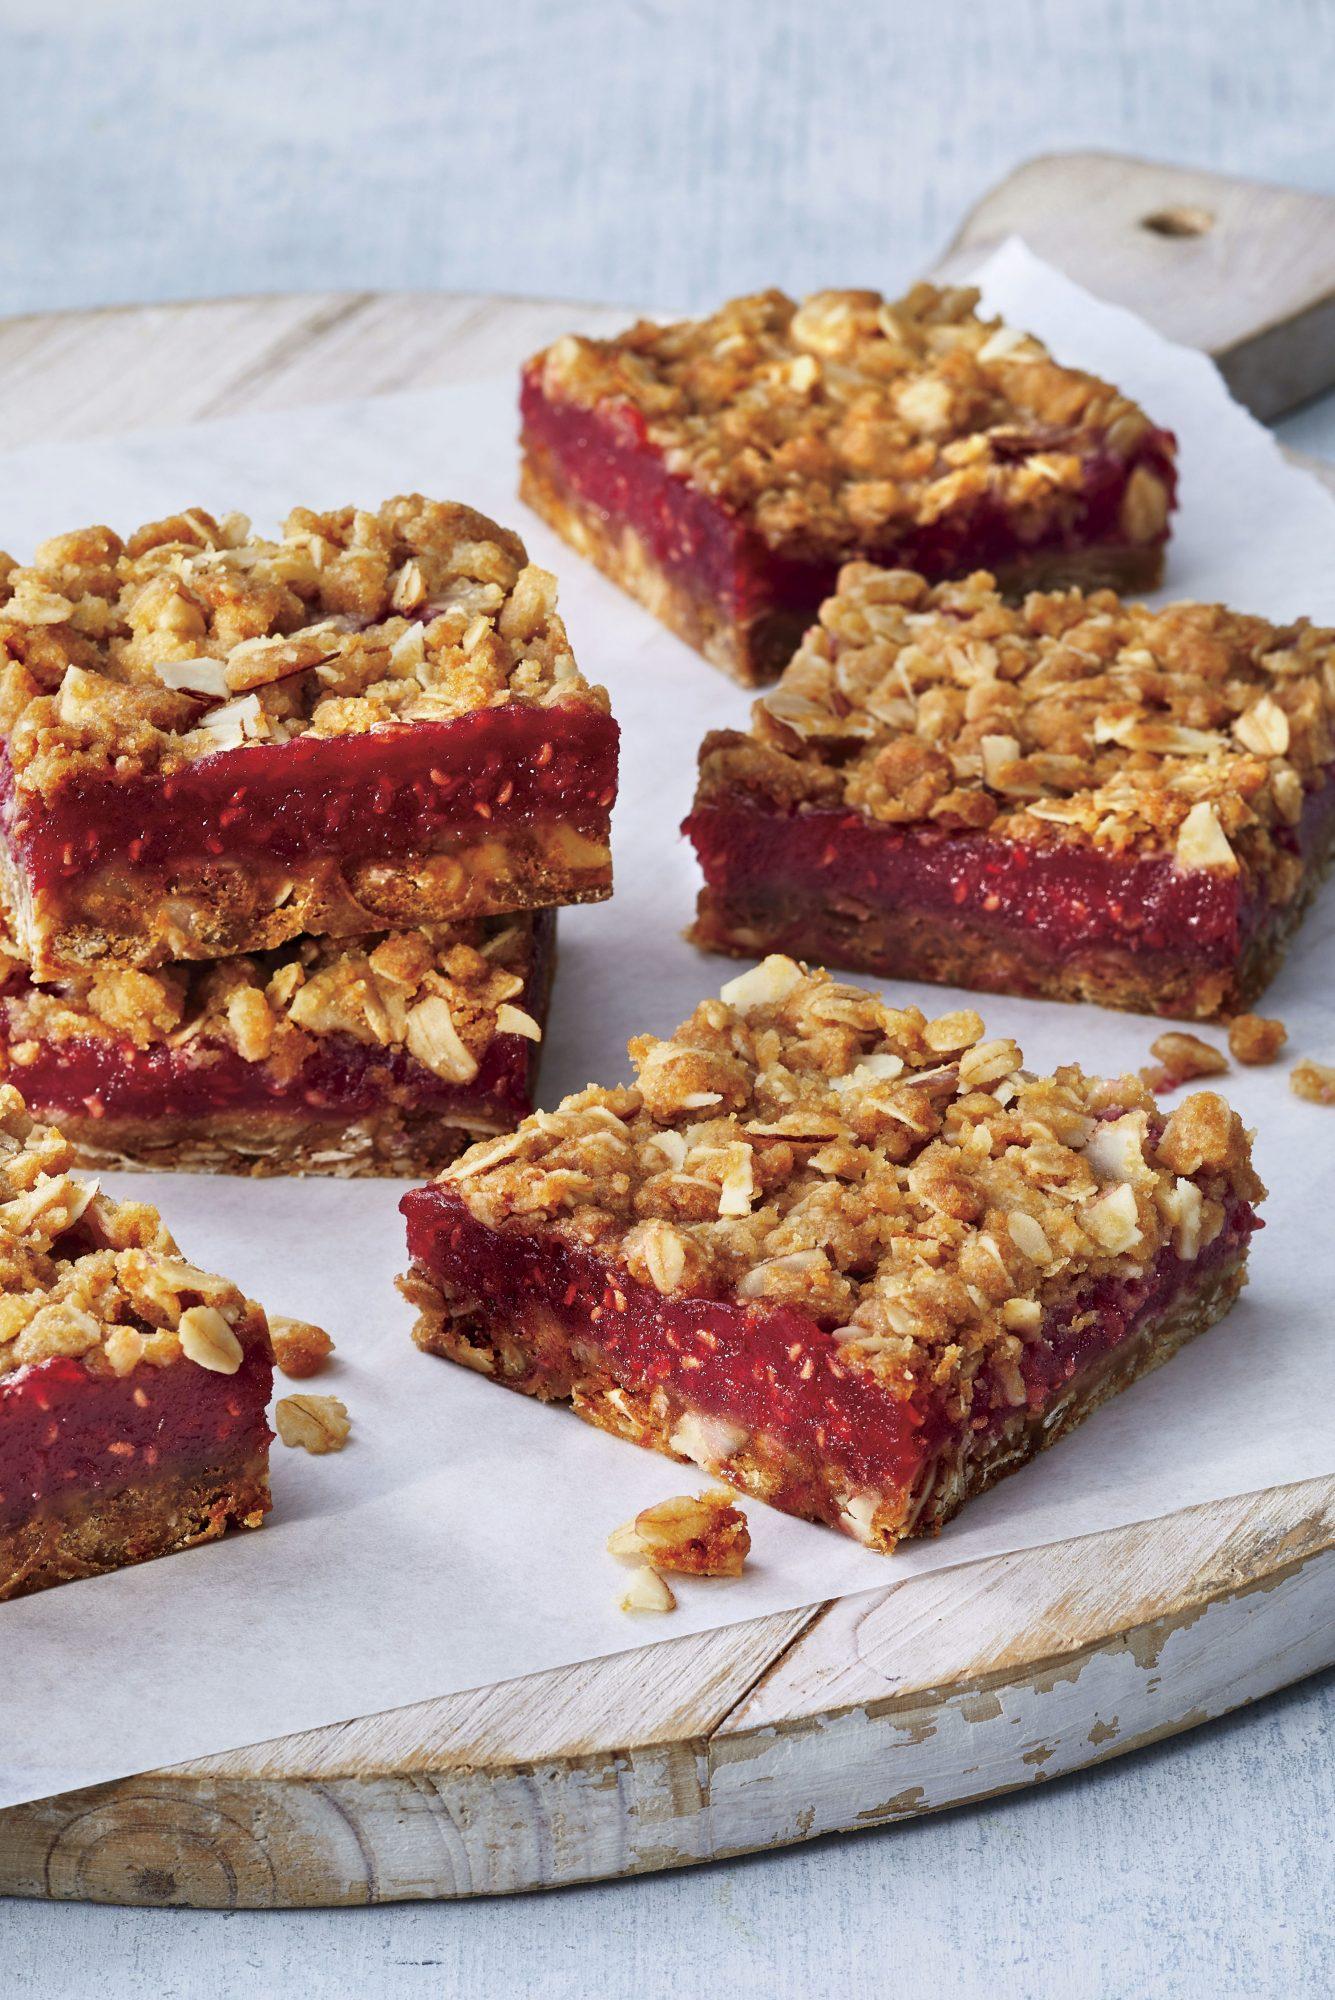 Raspberry-Almond Crumble Bars